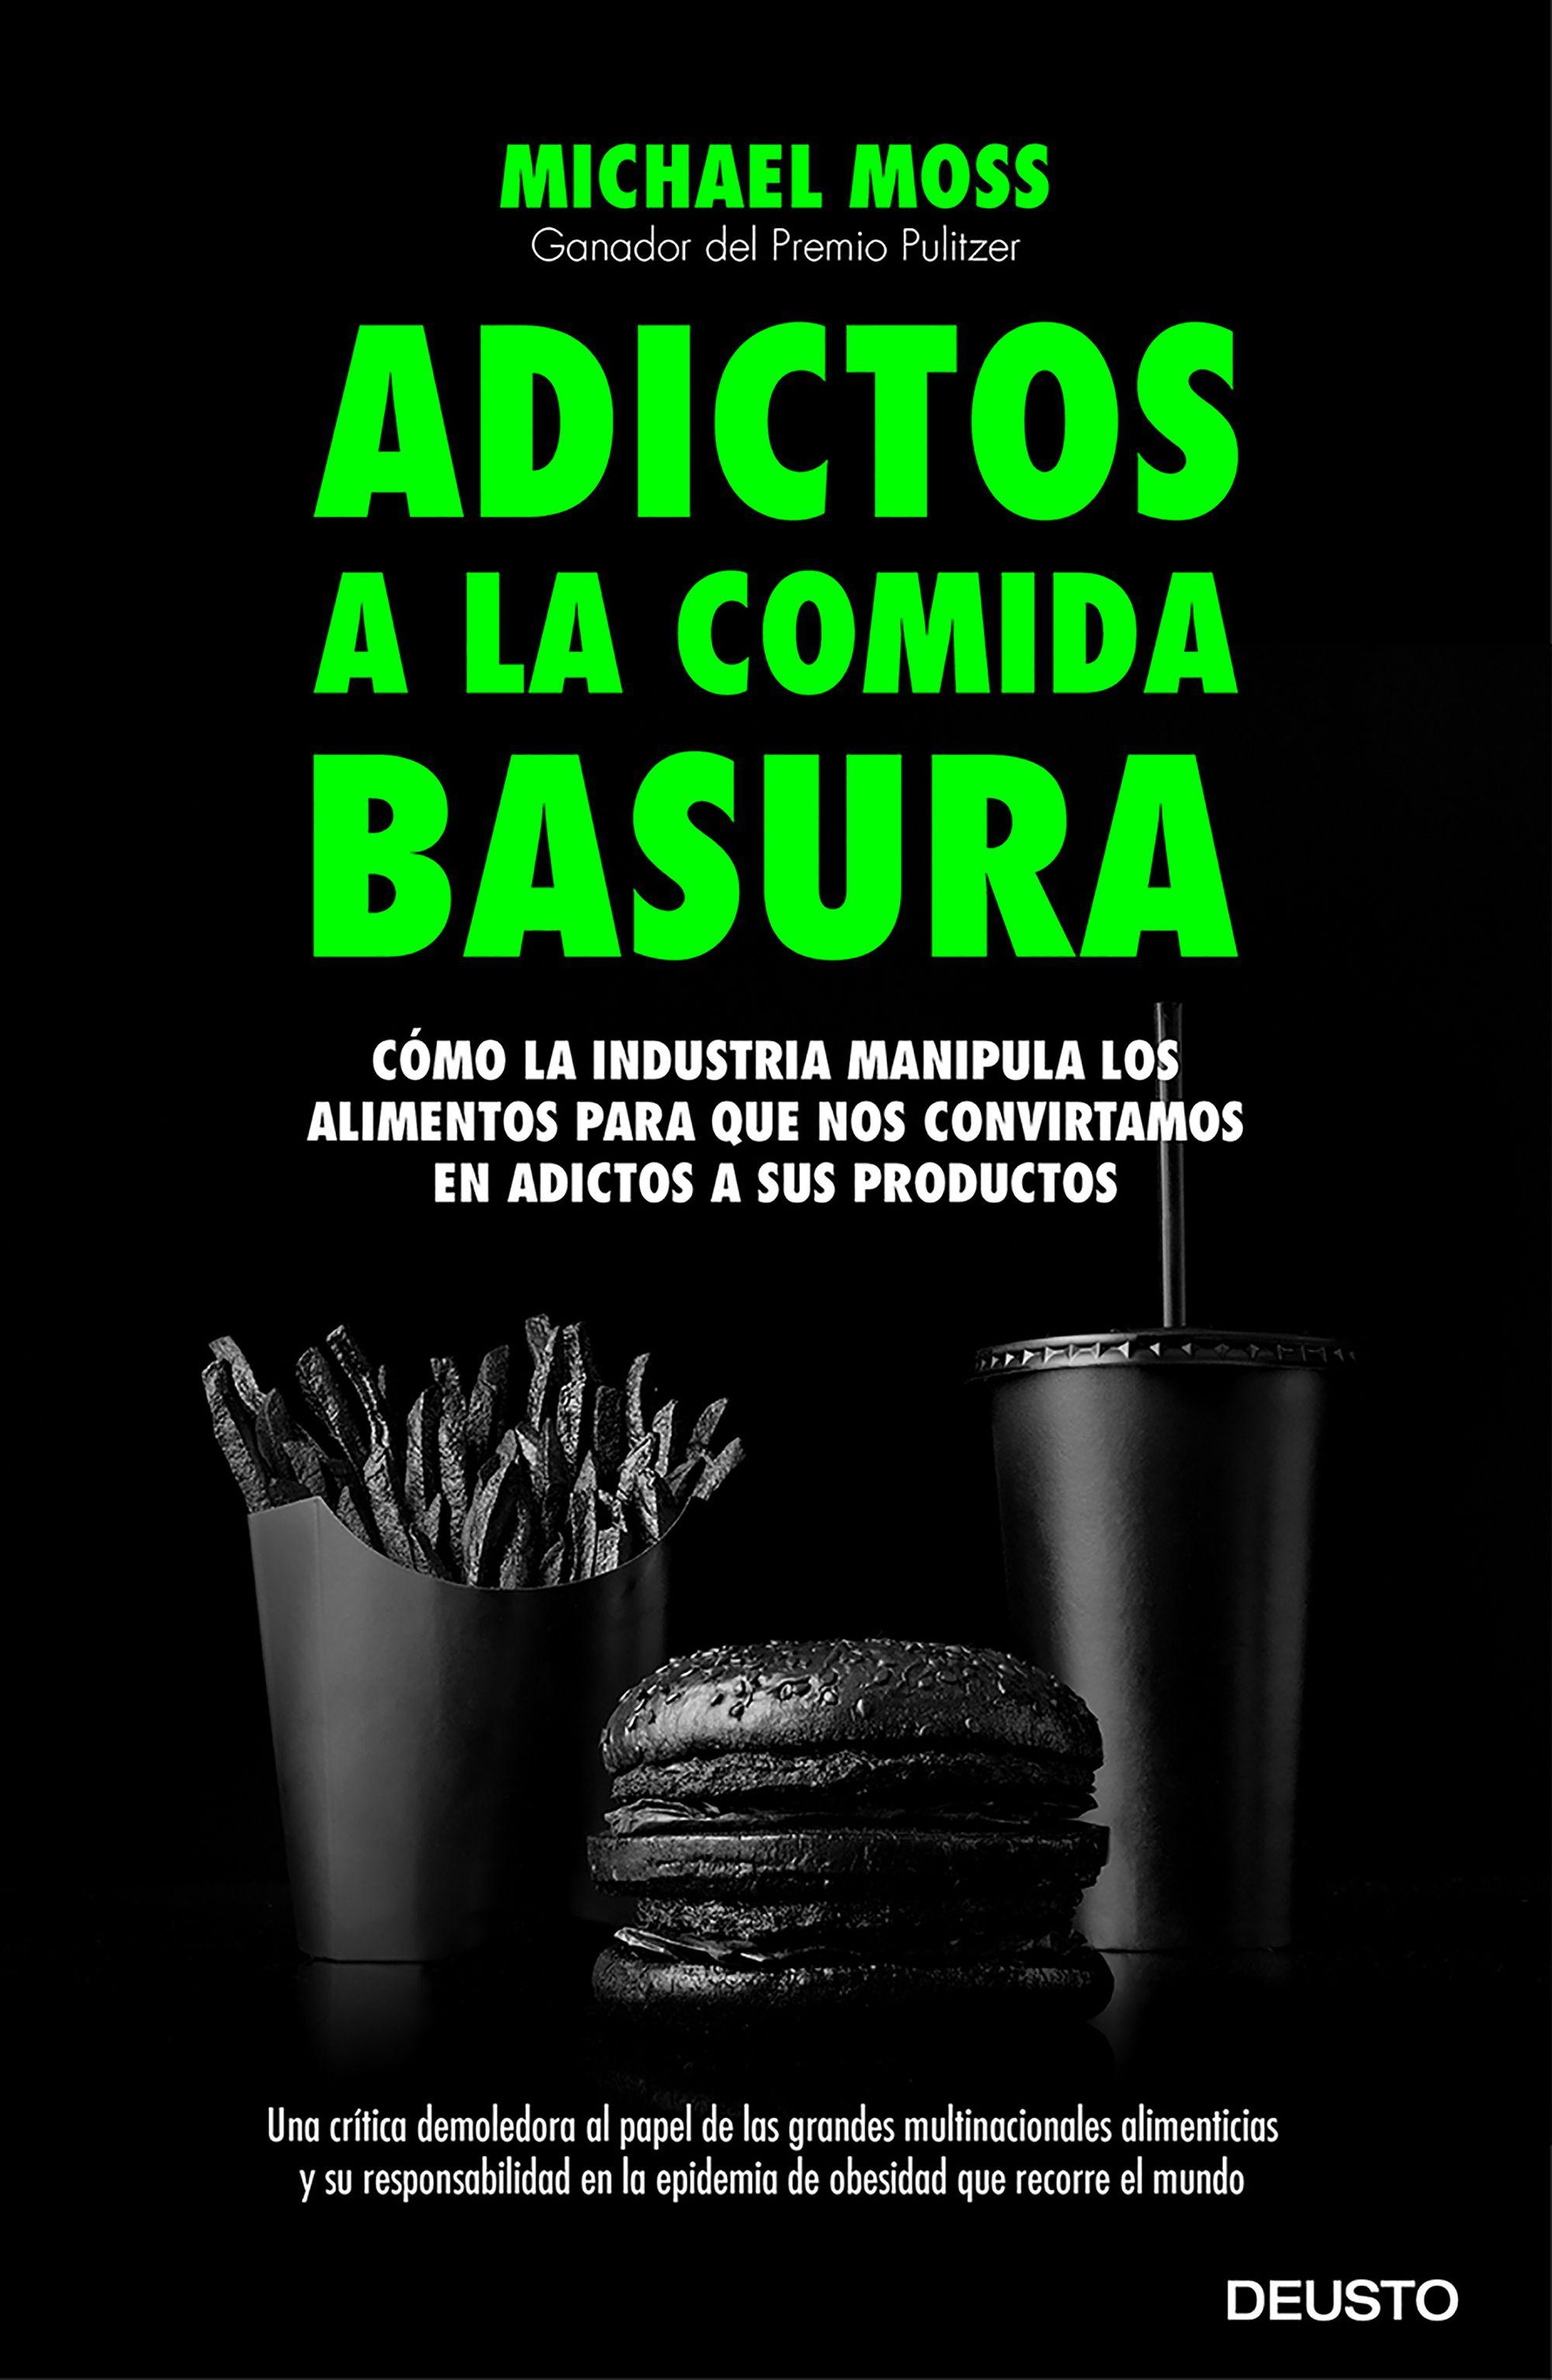 http://www.delascosasdelcomer.com/wp-content/uploads/2016/04/portada_adictos-a-la-comida-basura_mar-vidal-aparicio_201602282027.jpg